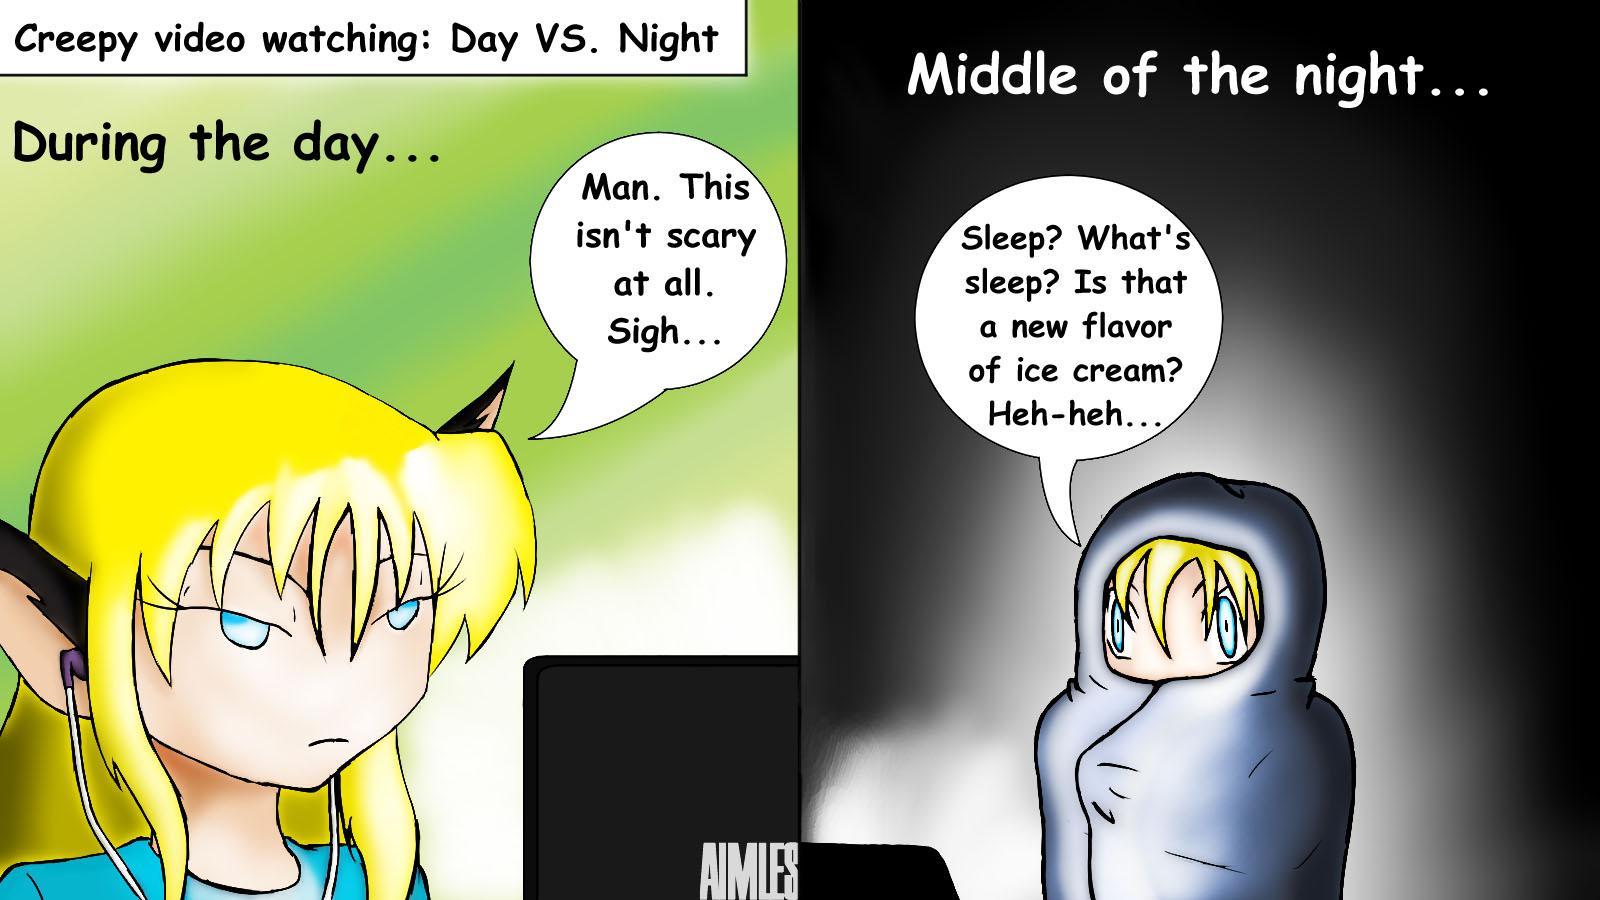 Day VS Night: Creepy video watching